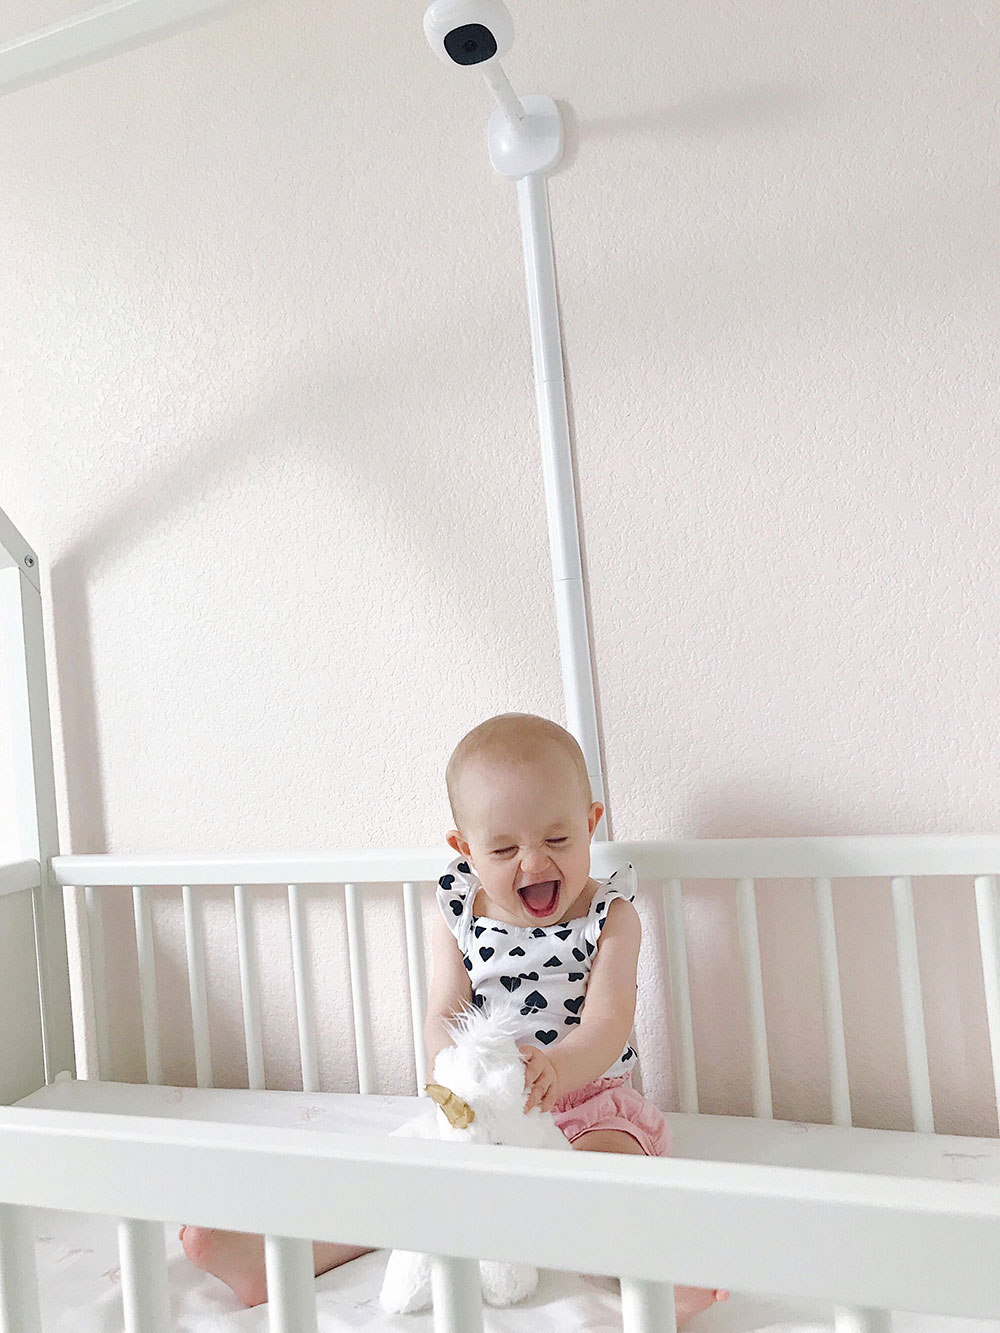 the nanit baby monitor